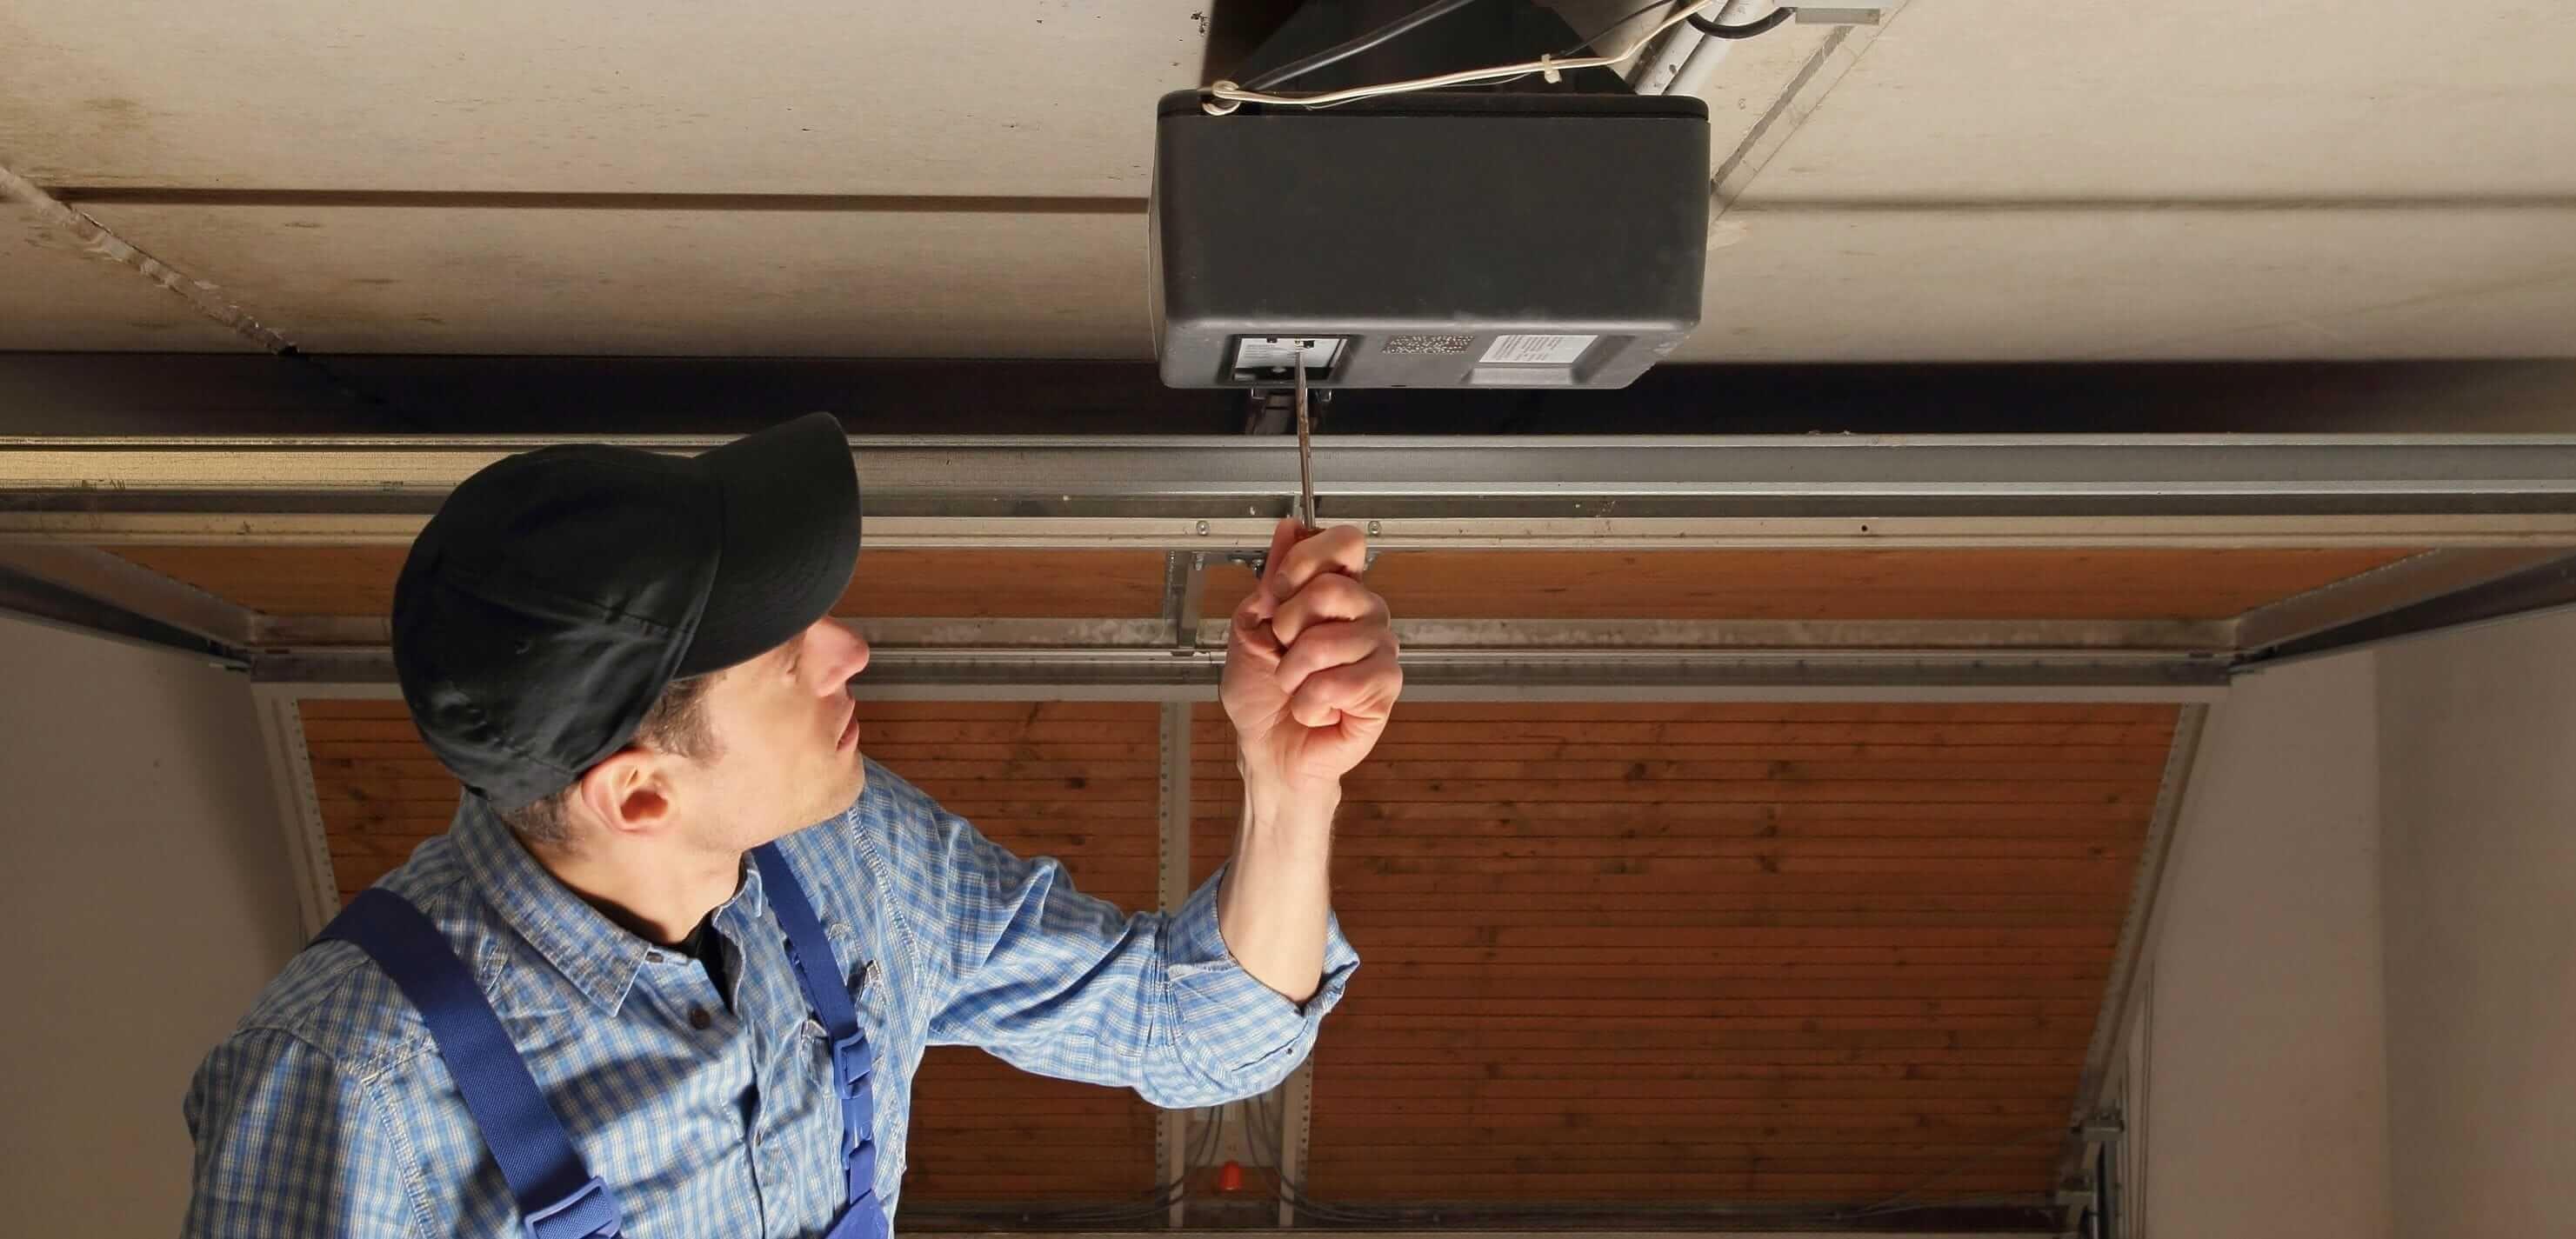 A1 Overhead Door Services Offers Excellent Quality In Both New Garage Door Installation Garage Door Opener Repair Garage Door Springs Garage Door Installation